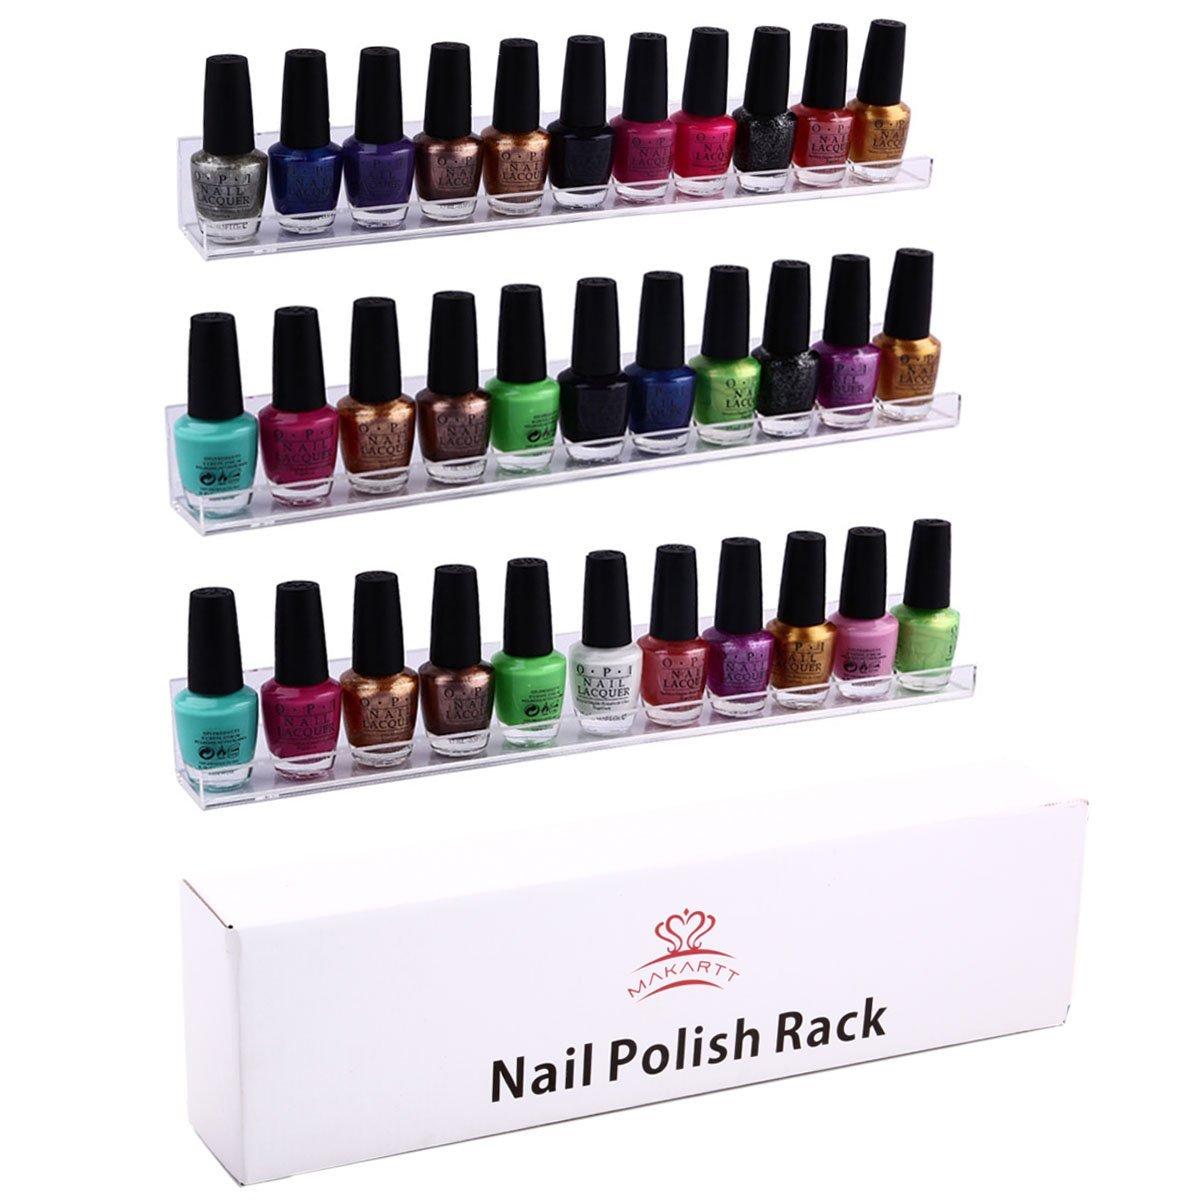 3 shelf set wall mount acrylic nail polish rack holds 33. Black Bedroom Furniture Sets. Home Design Ideas